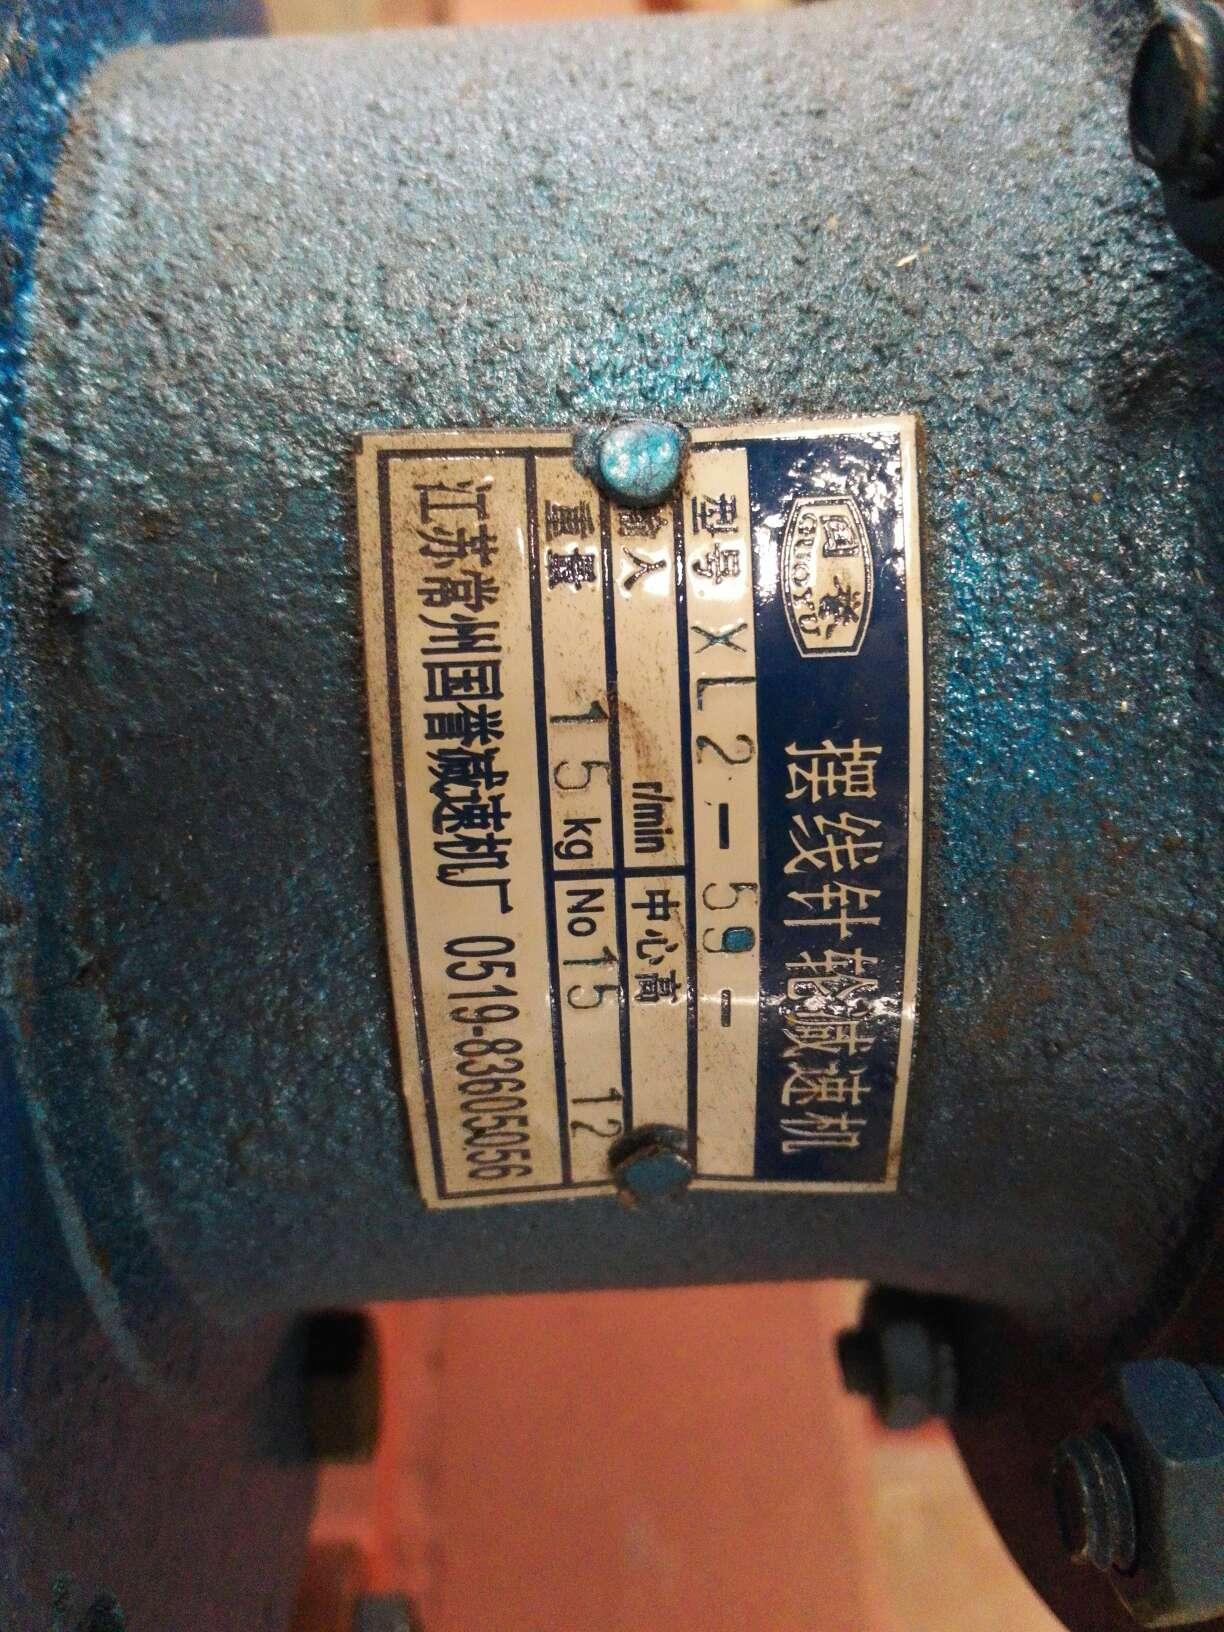 air jordan 22 basketball leather for sale 00219225 cheapestonline